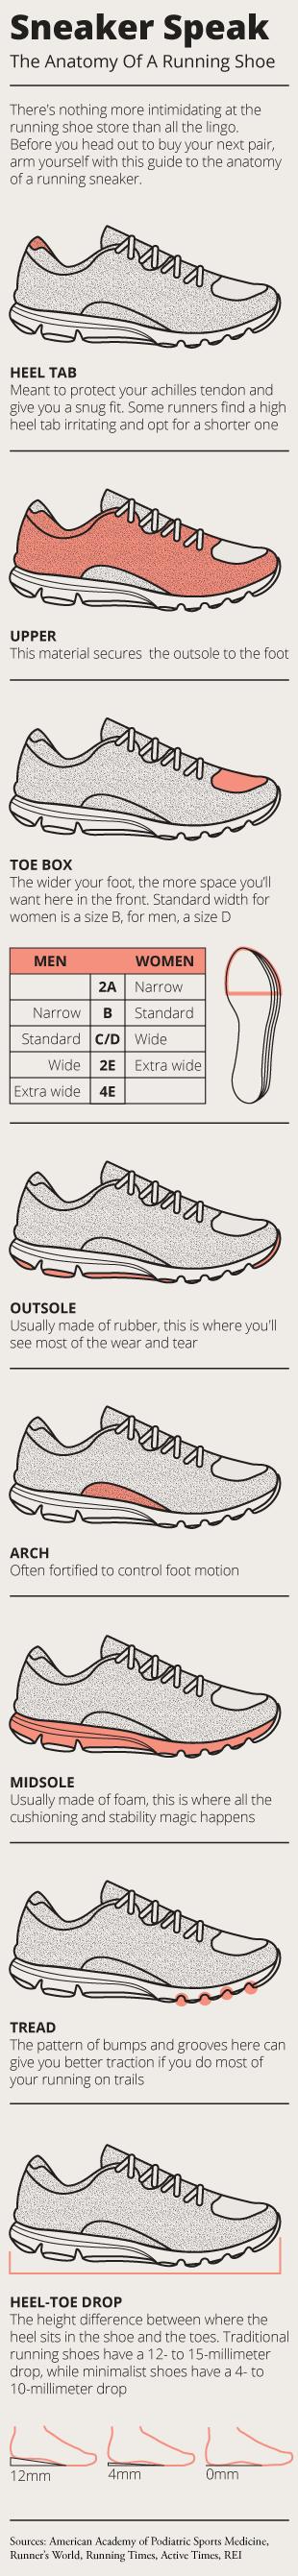 Dorable Running Shoe Anatomy Pictures - Anatomy Ideas - yunoki.info